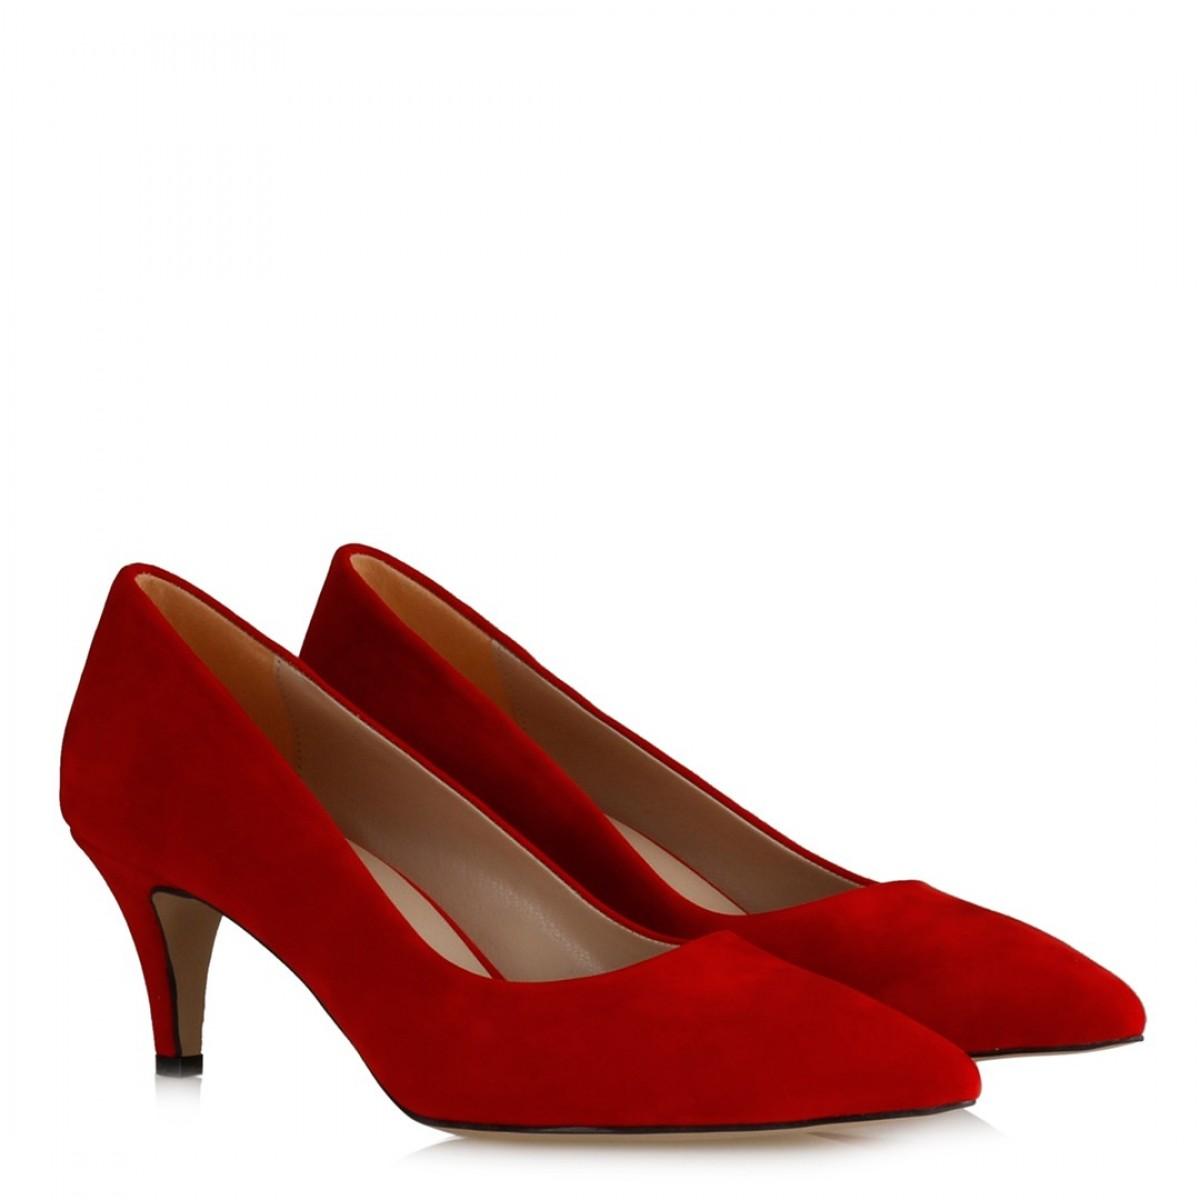 Stiletto Az Topuklu Kırmızı Süet